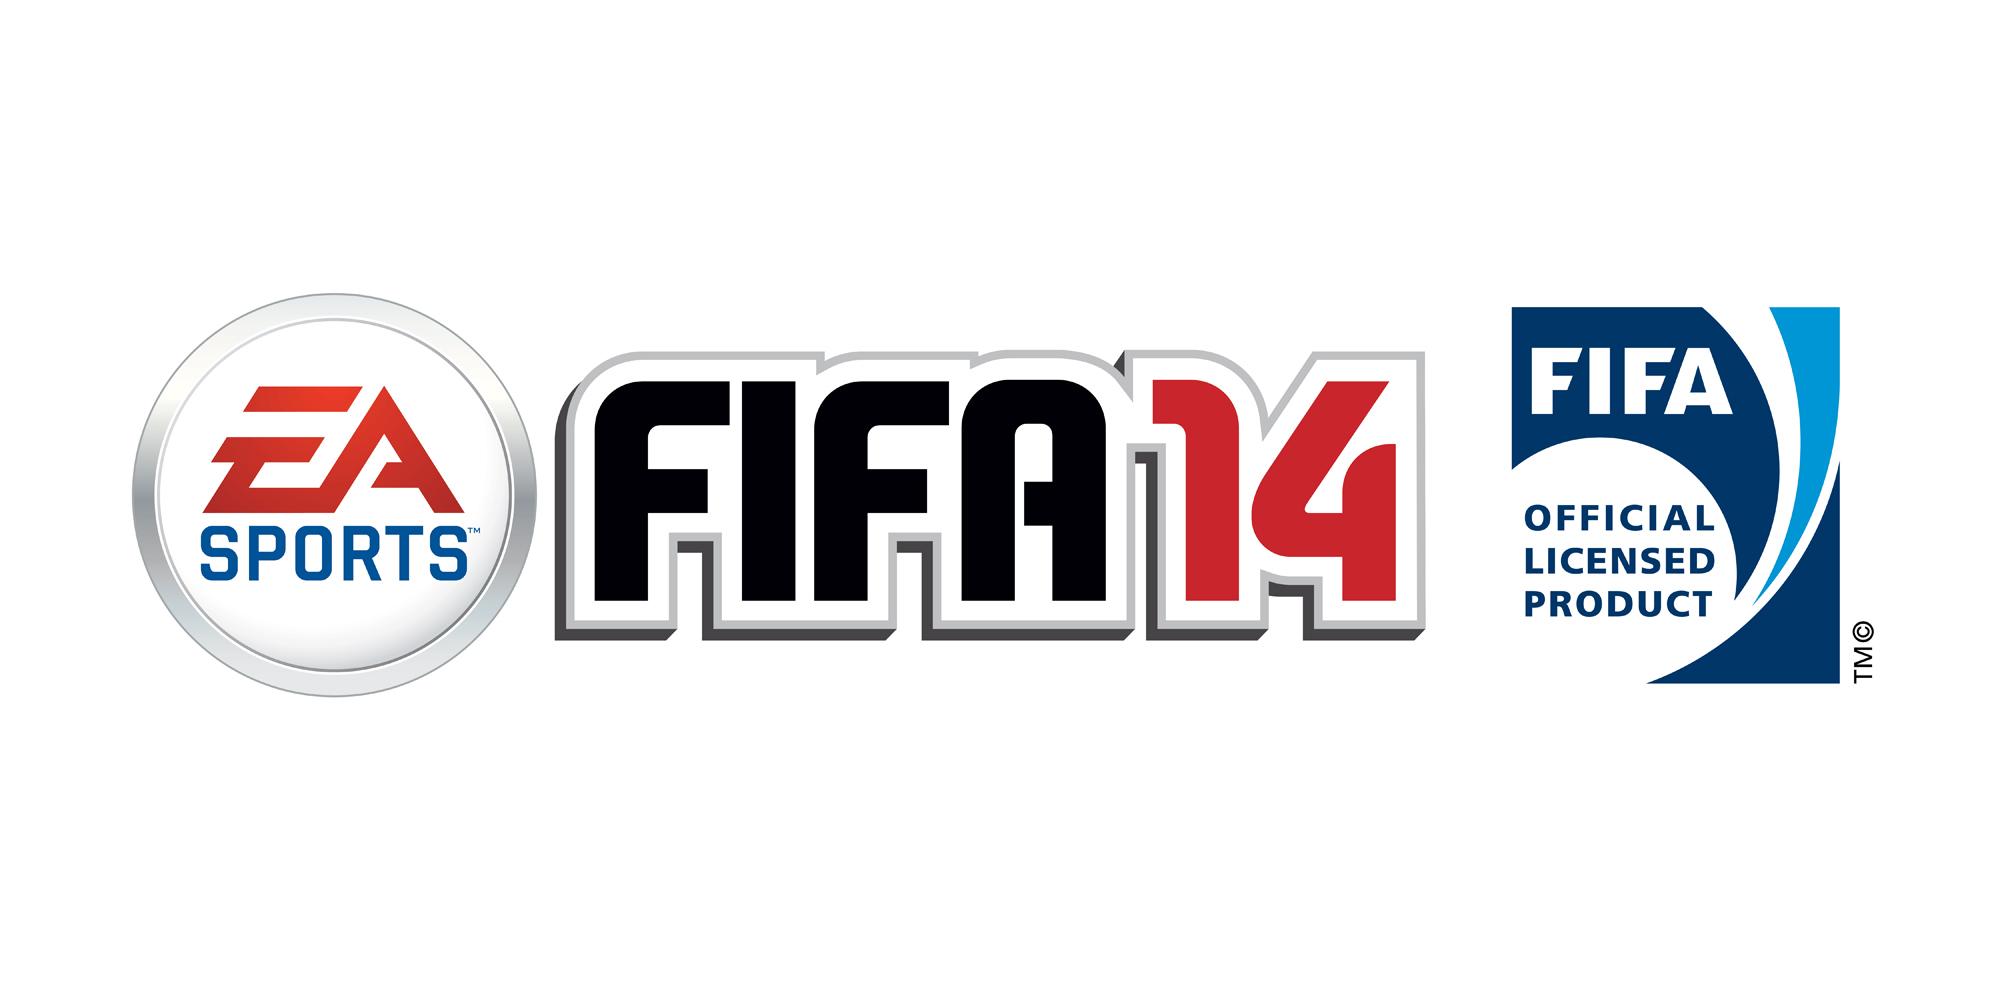 Précommander FIFA 14